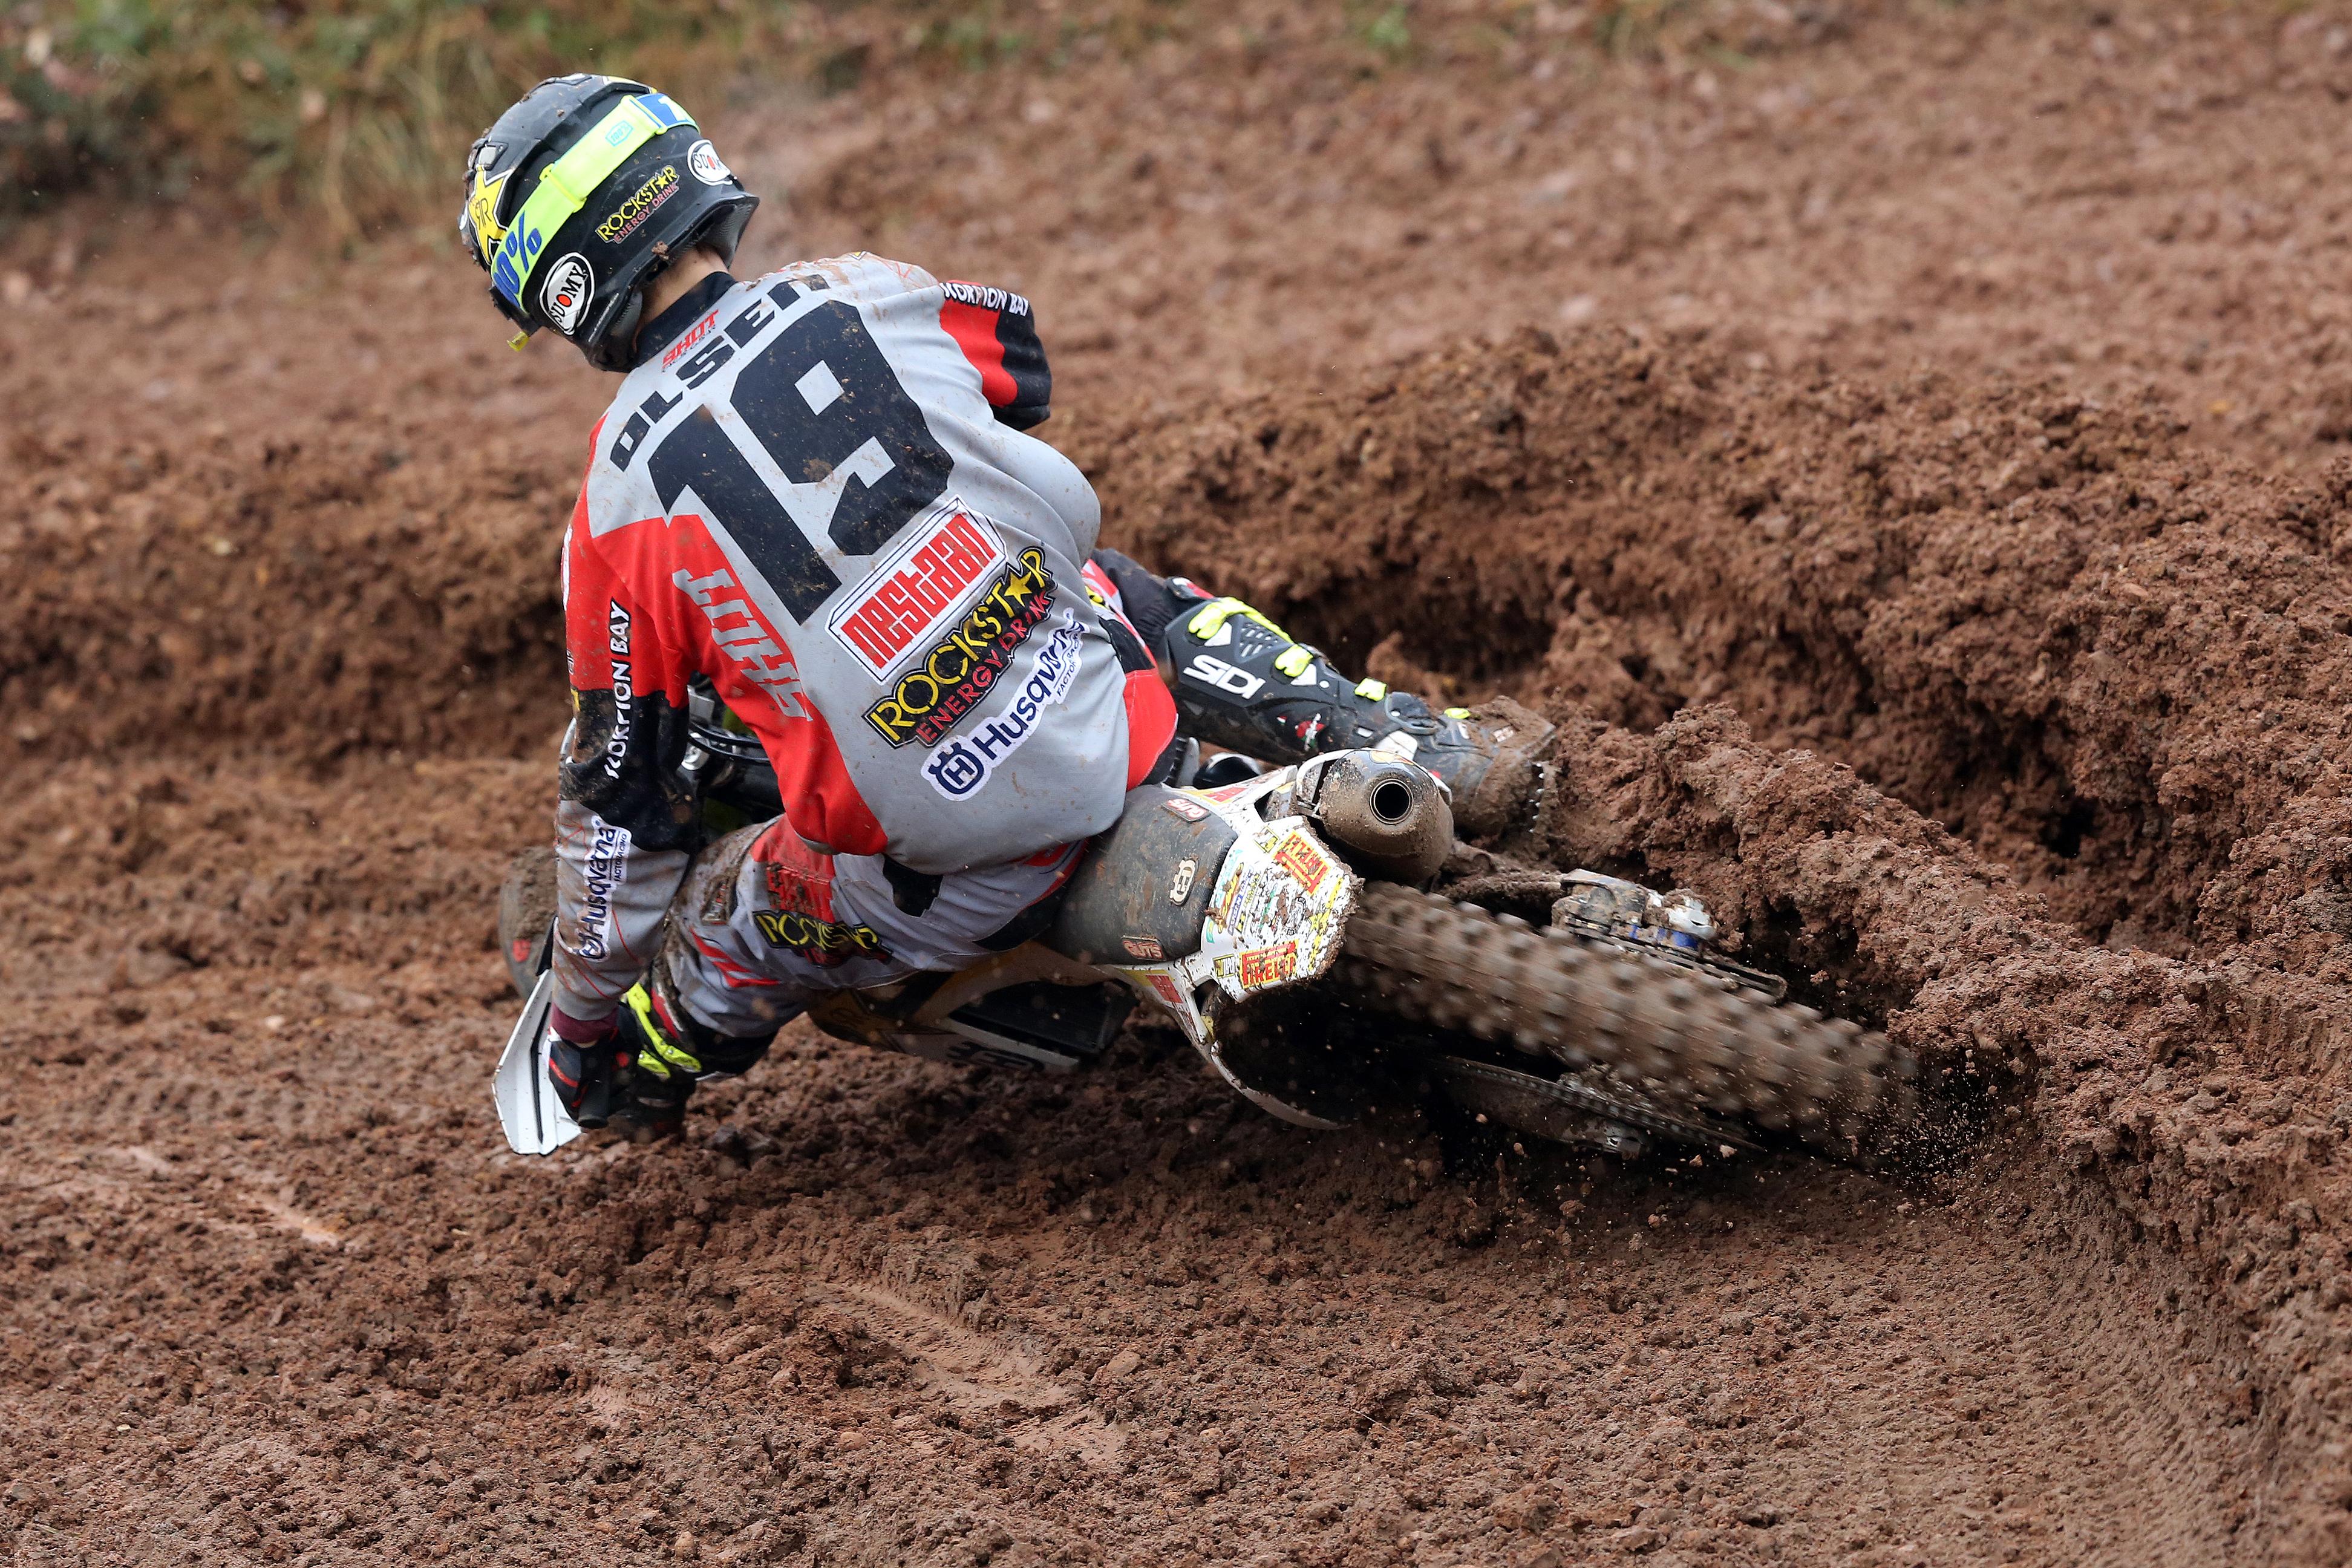 Lacapelle Marival Mastercross - Thomas Kjer-Olsen – Rockstar Energy Husqvarna Factory Racing